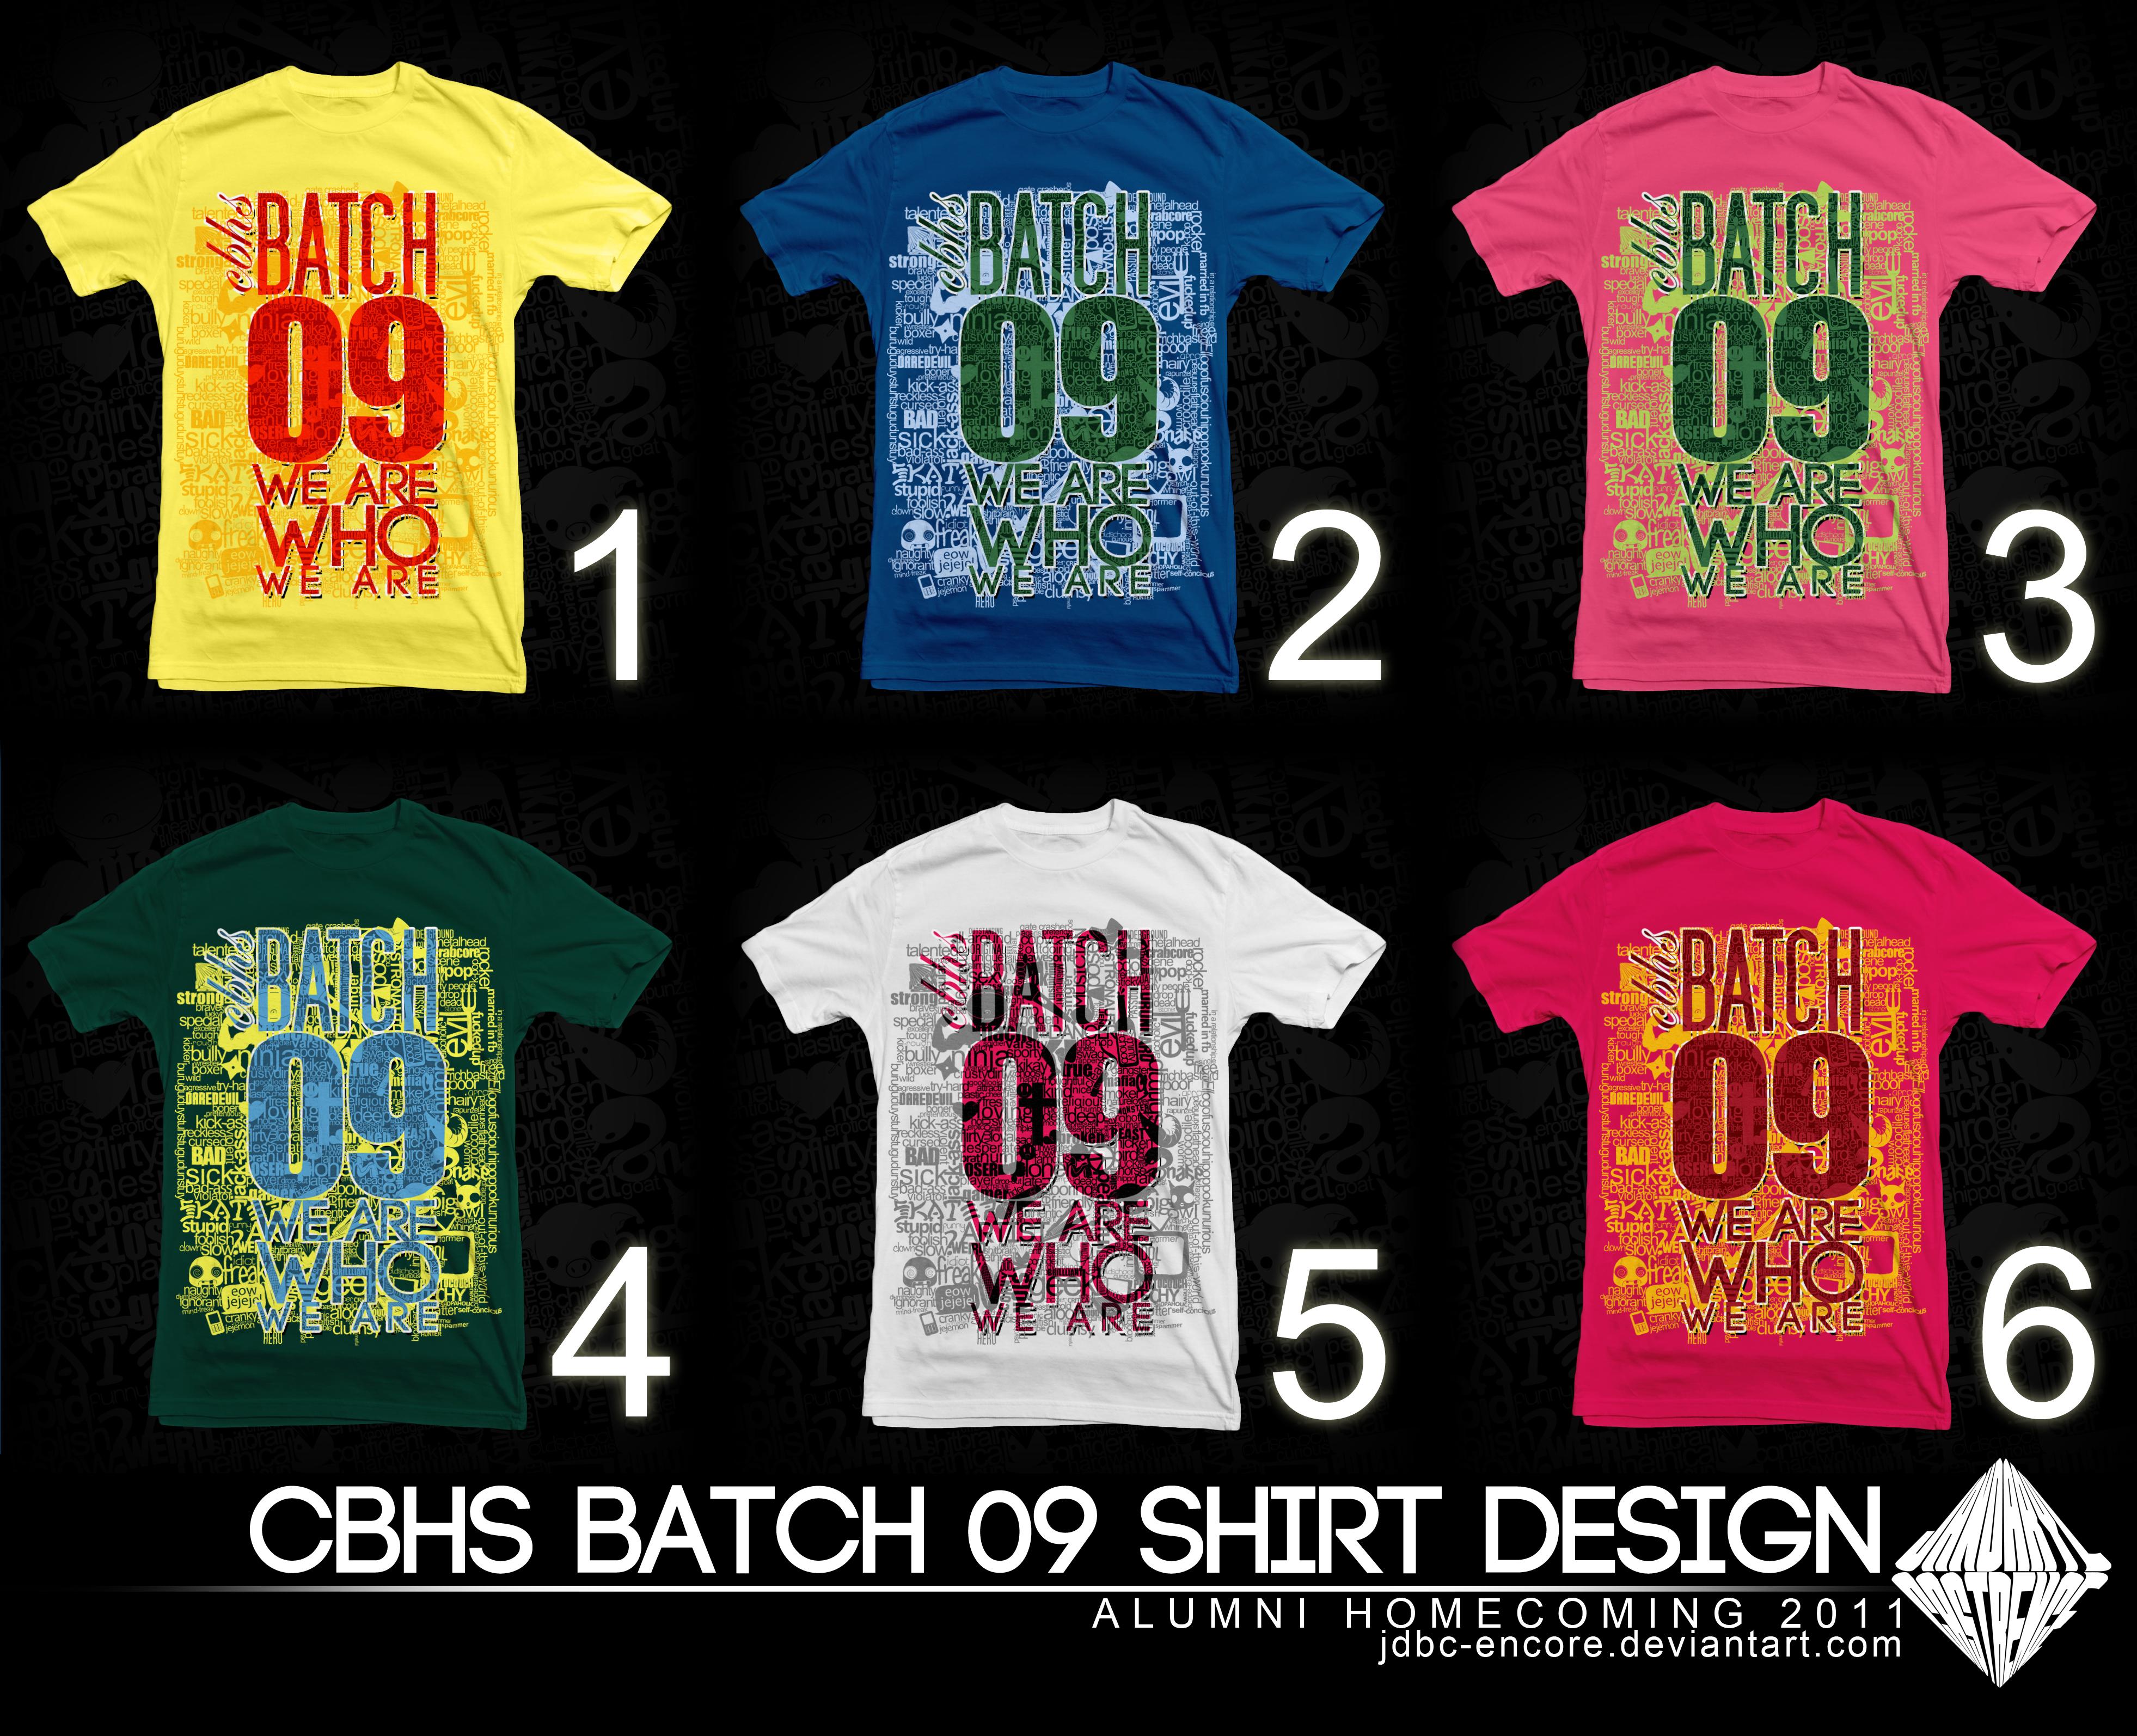 Tshirt design for alumni homecoming - Cbhs Batch 09 Shirt Design 11 By Jdbc Encore